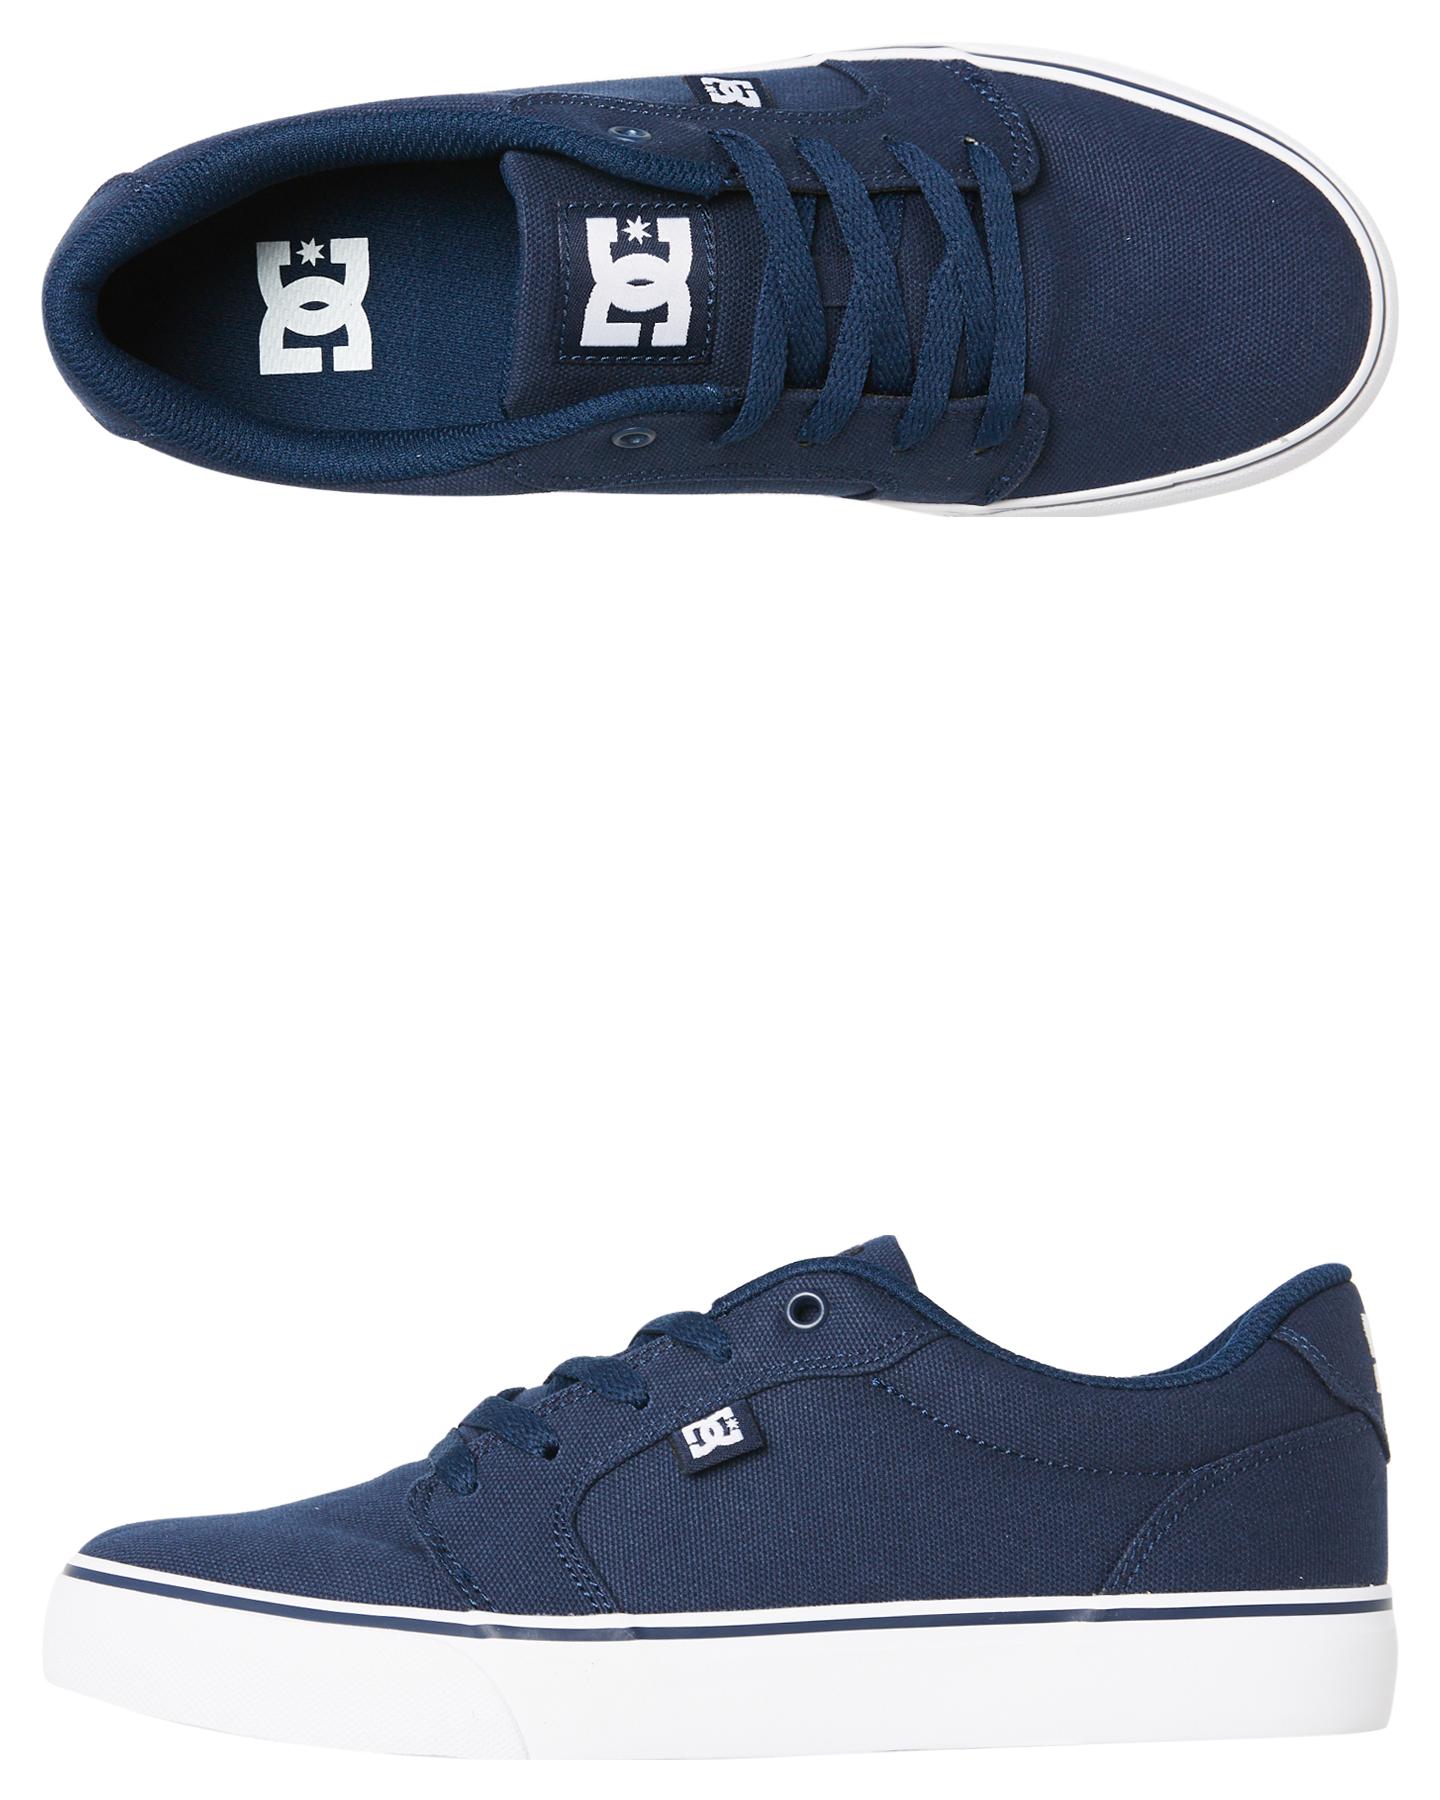 bc1e1a58a408 Dc Shoes Mens Anvil Tx Shoe - Navy White